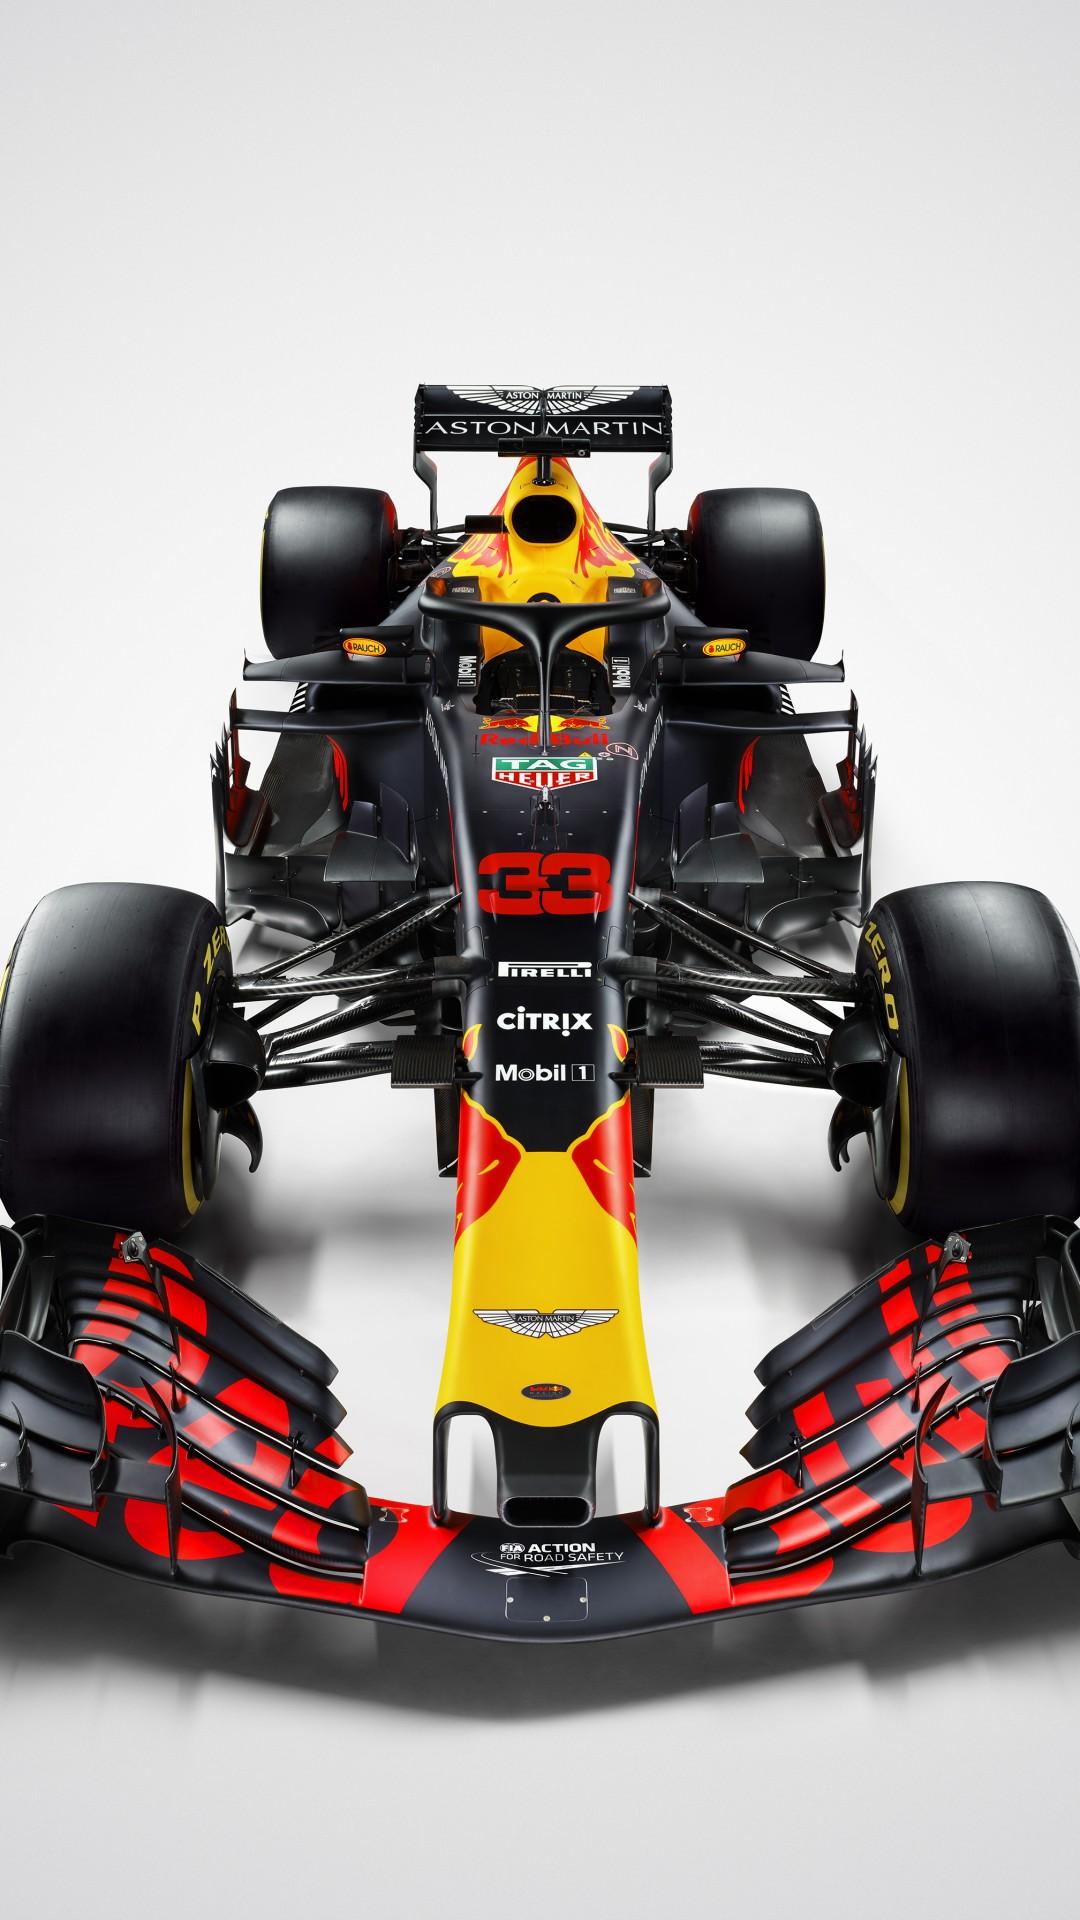 Wallpaper Aston Martin Red Bull Racing F1 Geneva Motor